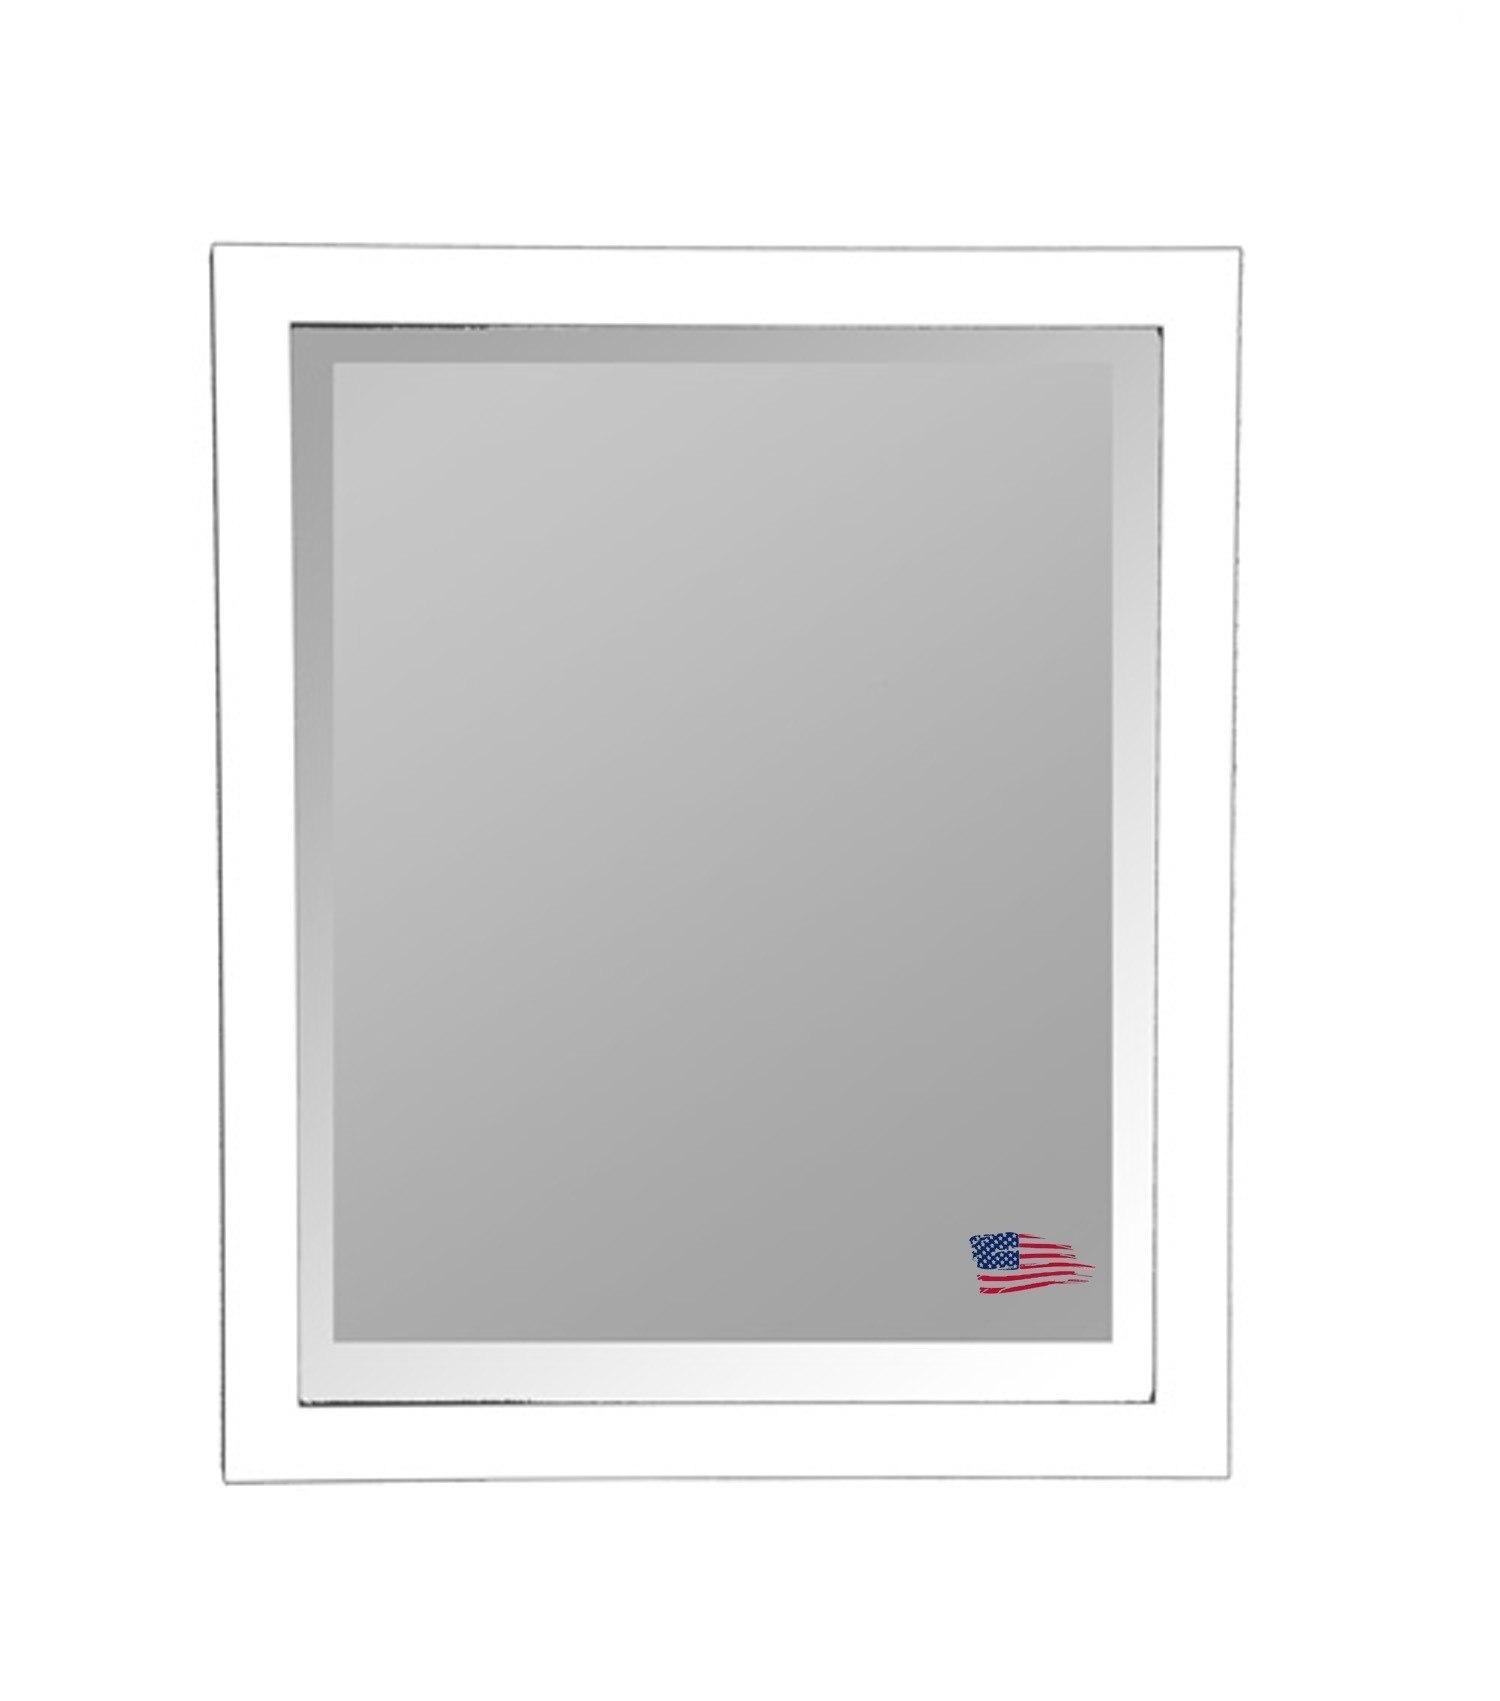 Rayne Mirrors R021MV 33.5 x 33.5 Inch Glossy White Wall Mirror